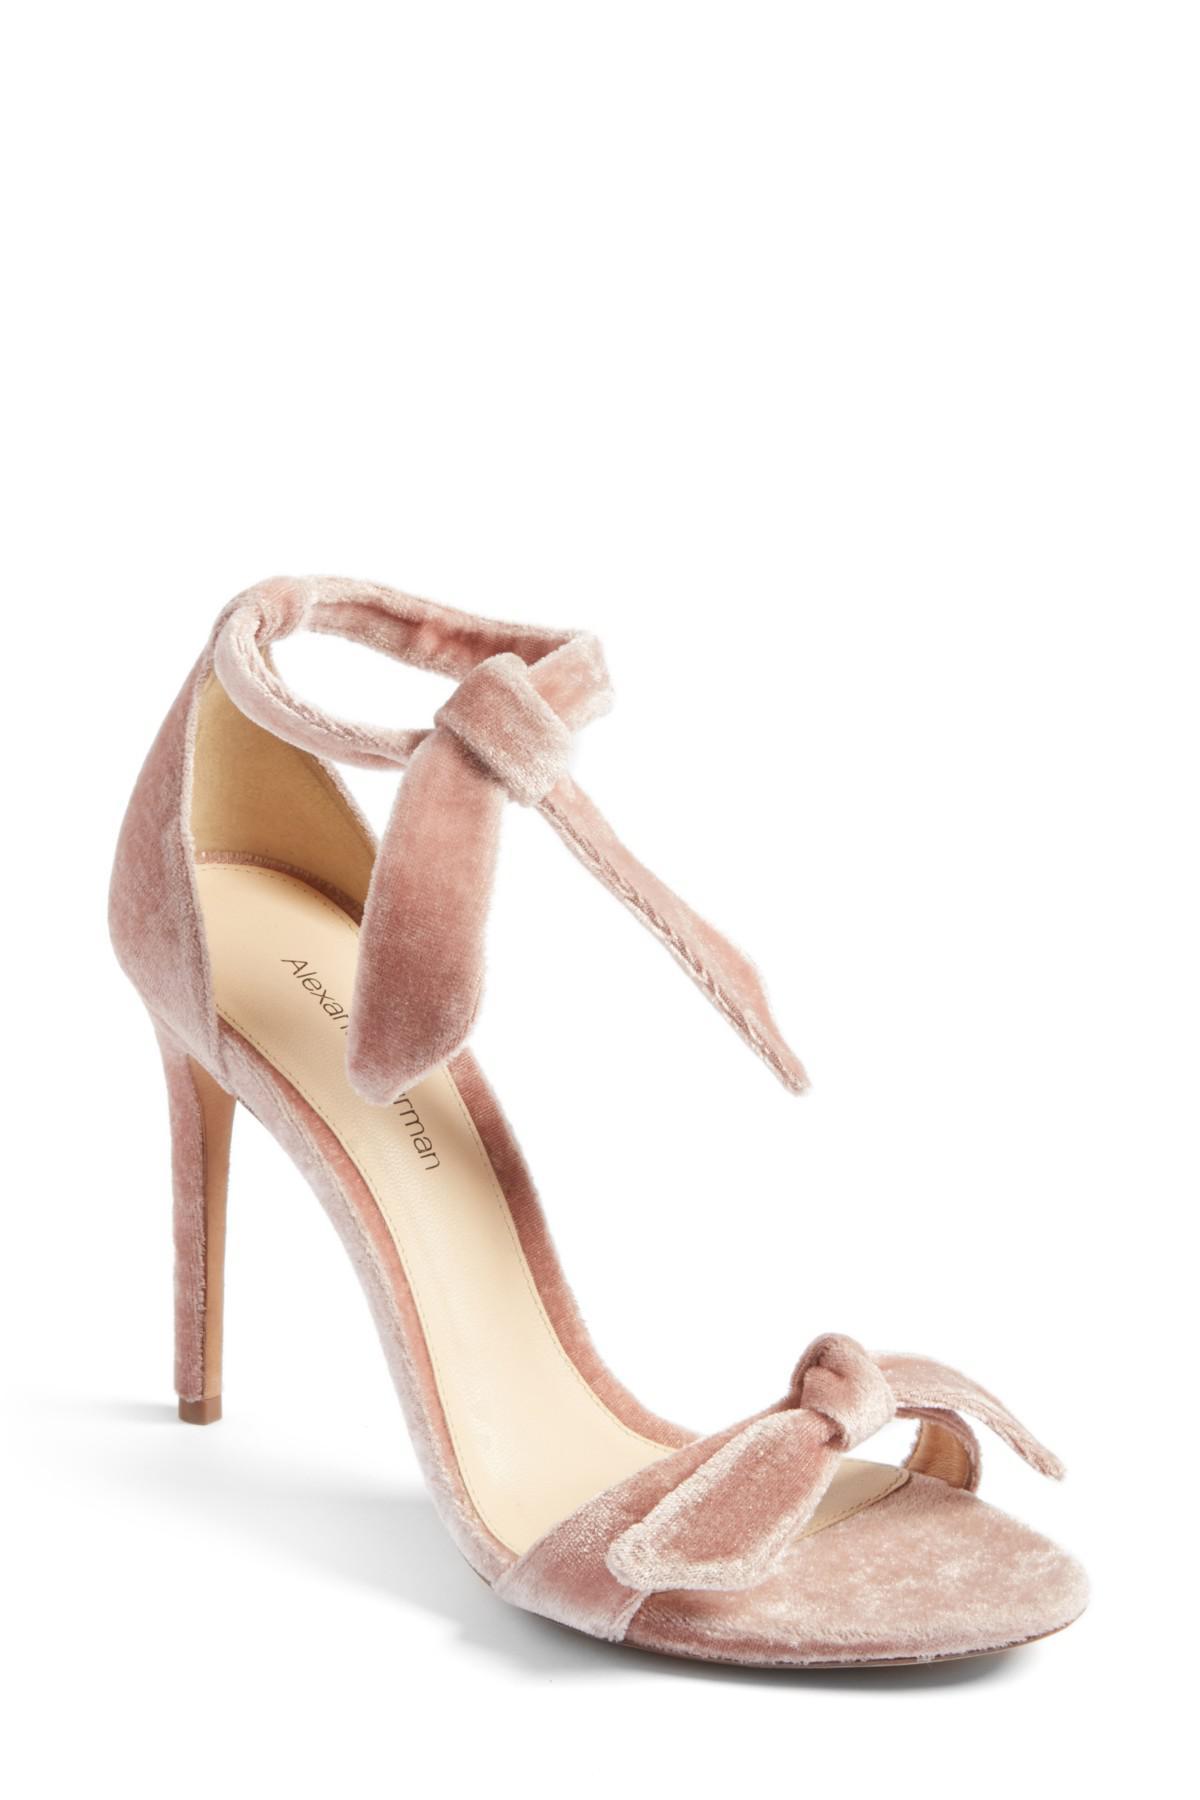 47b6b9e4d1b Lyst - Alexandre Birman Clarita Sandal (women) in Pink